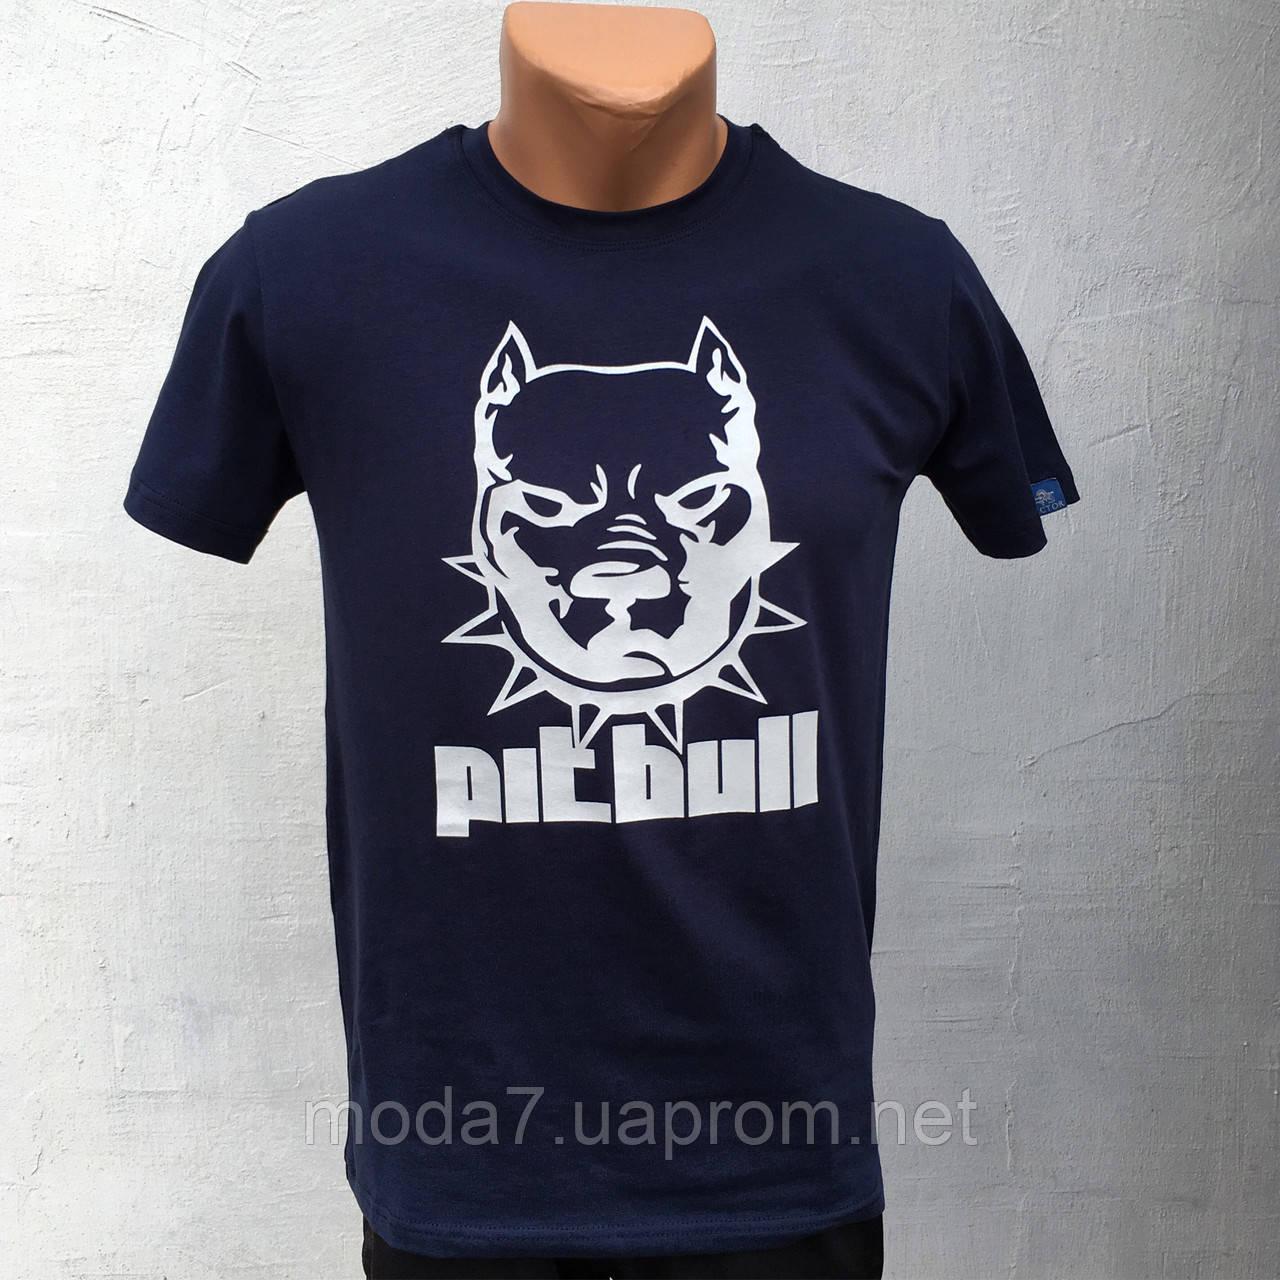 Футболка мужская синяя HR собака Pitbull